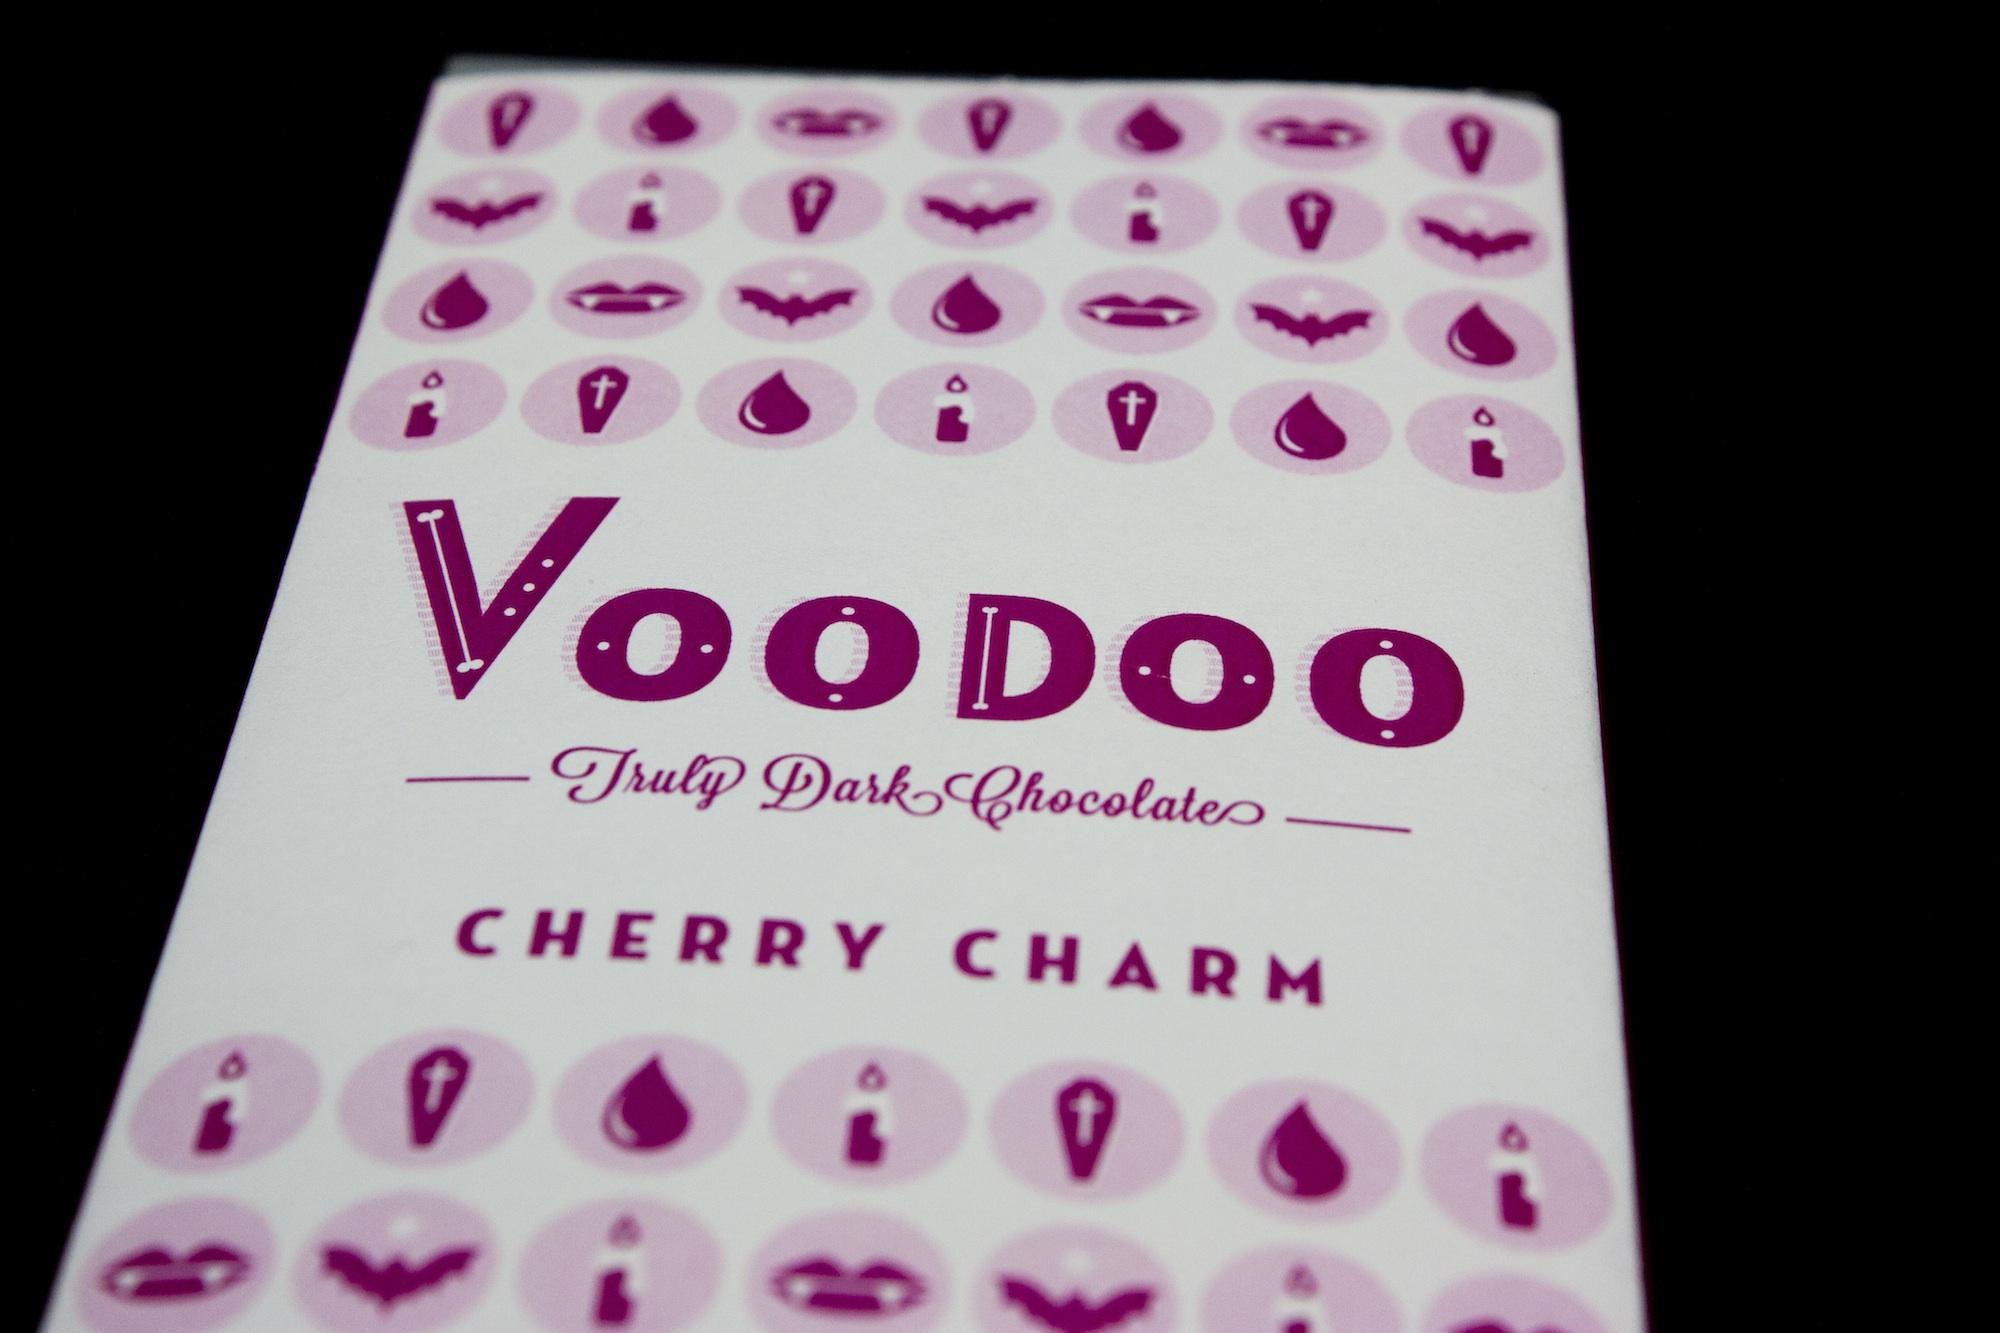 Voodoo_10x.jpg